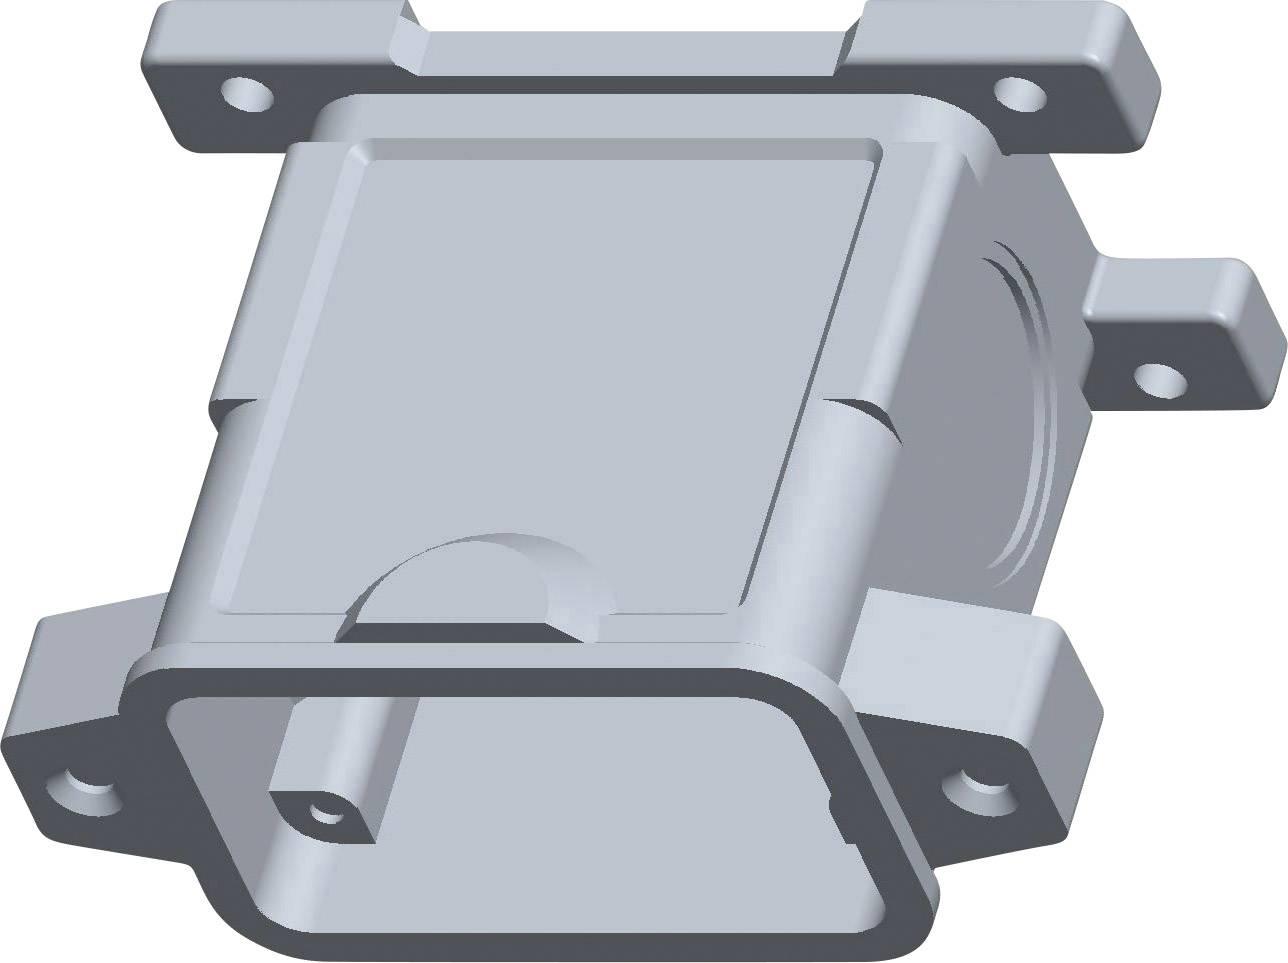 Pouzdro konektoru TE Connectivity EMV-K.10/24.SG.2.M32.G T1950100132-000, IP68, černá, 1 ks